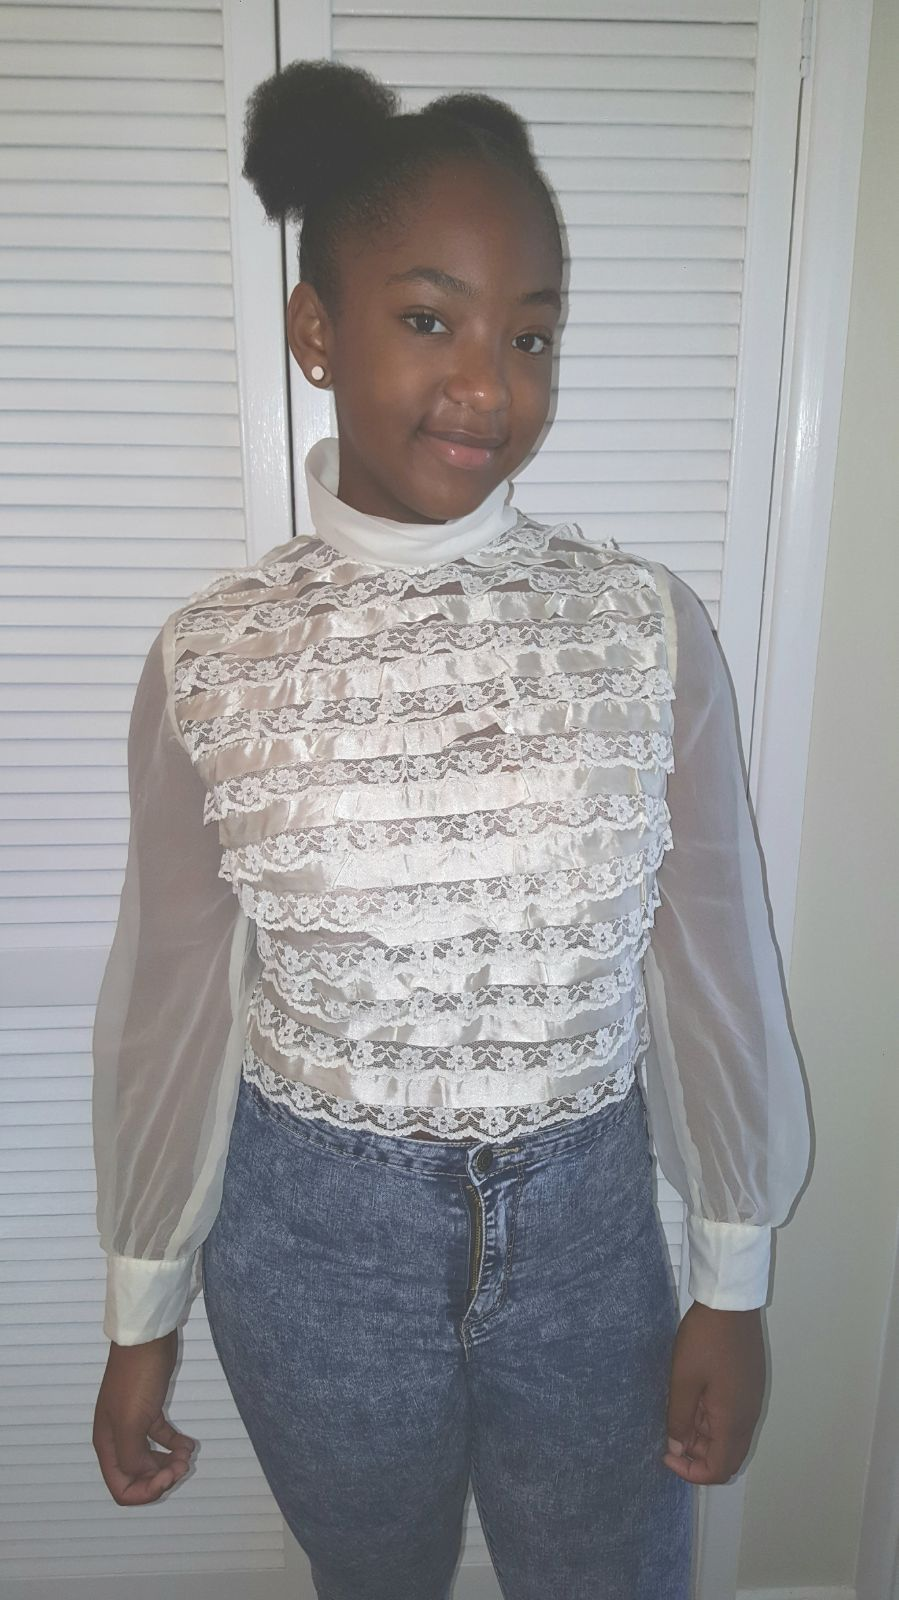 Alisons teenage daughter, Jaya,wearing her grandmothers vintage lace blouse.